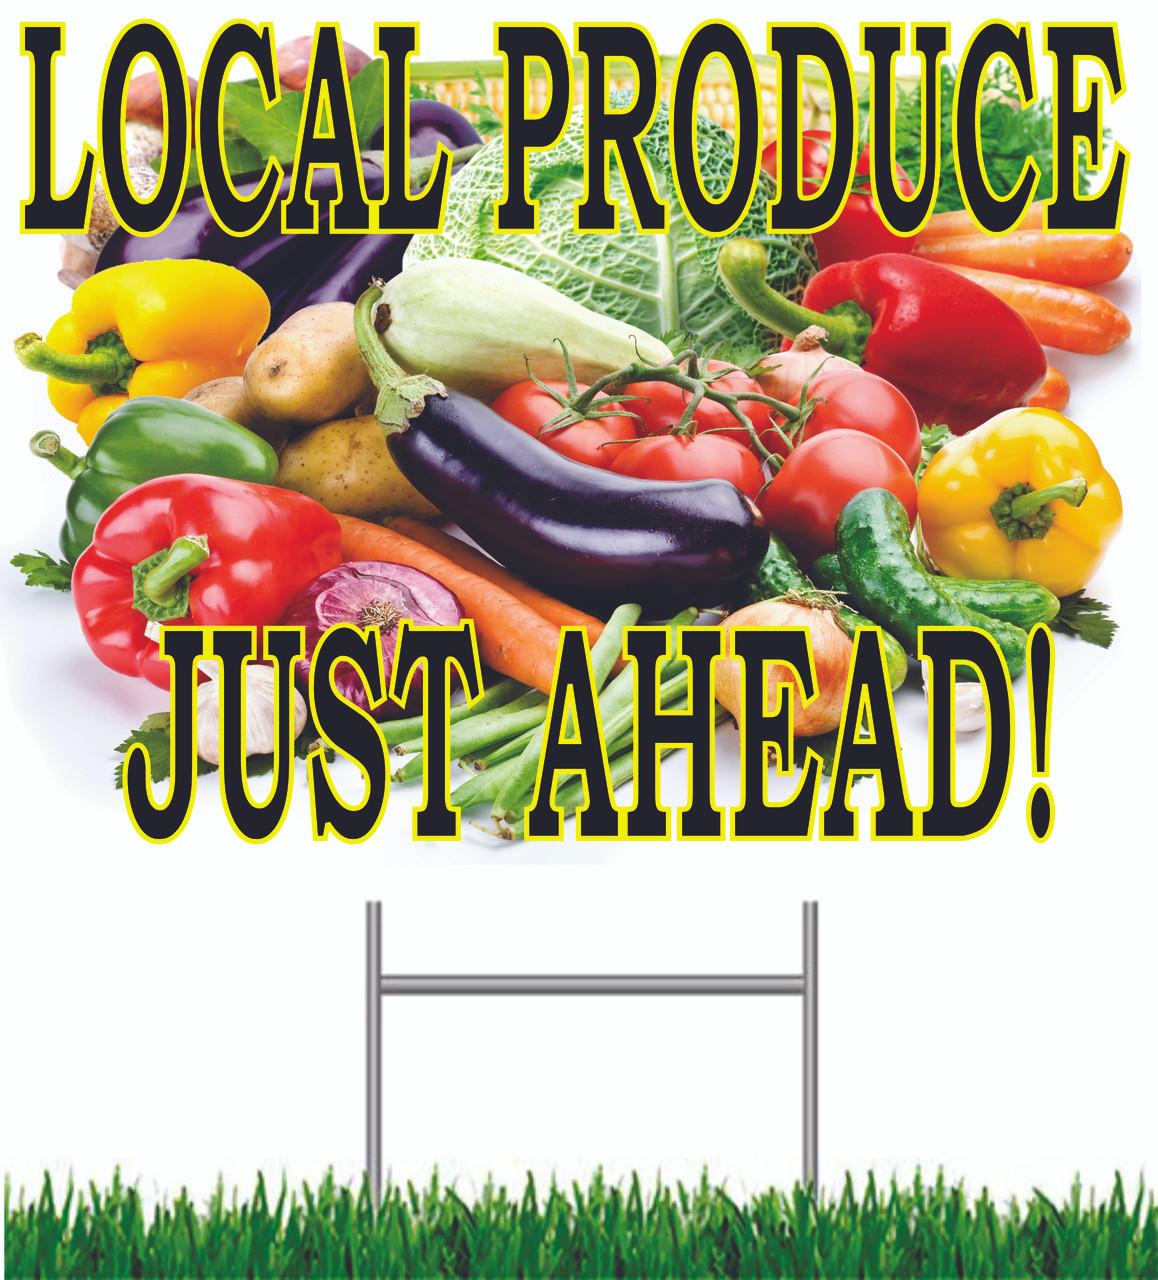 Local Produce Just Ahead Yard Sign.